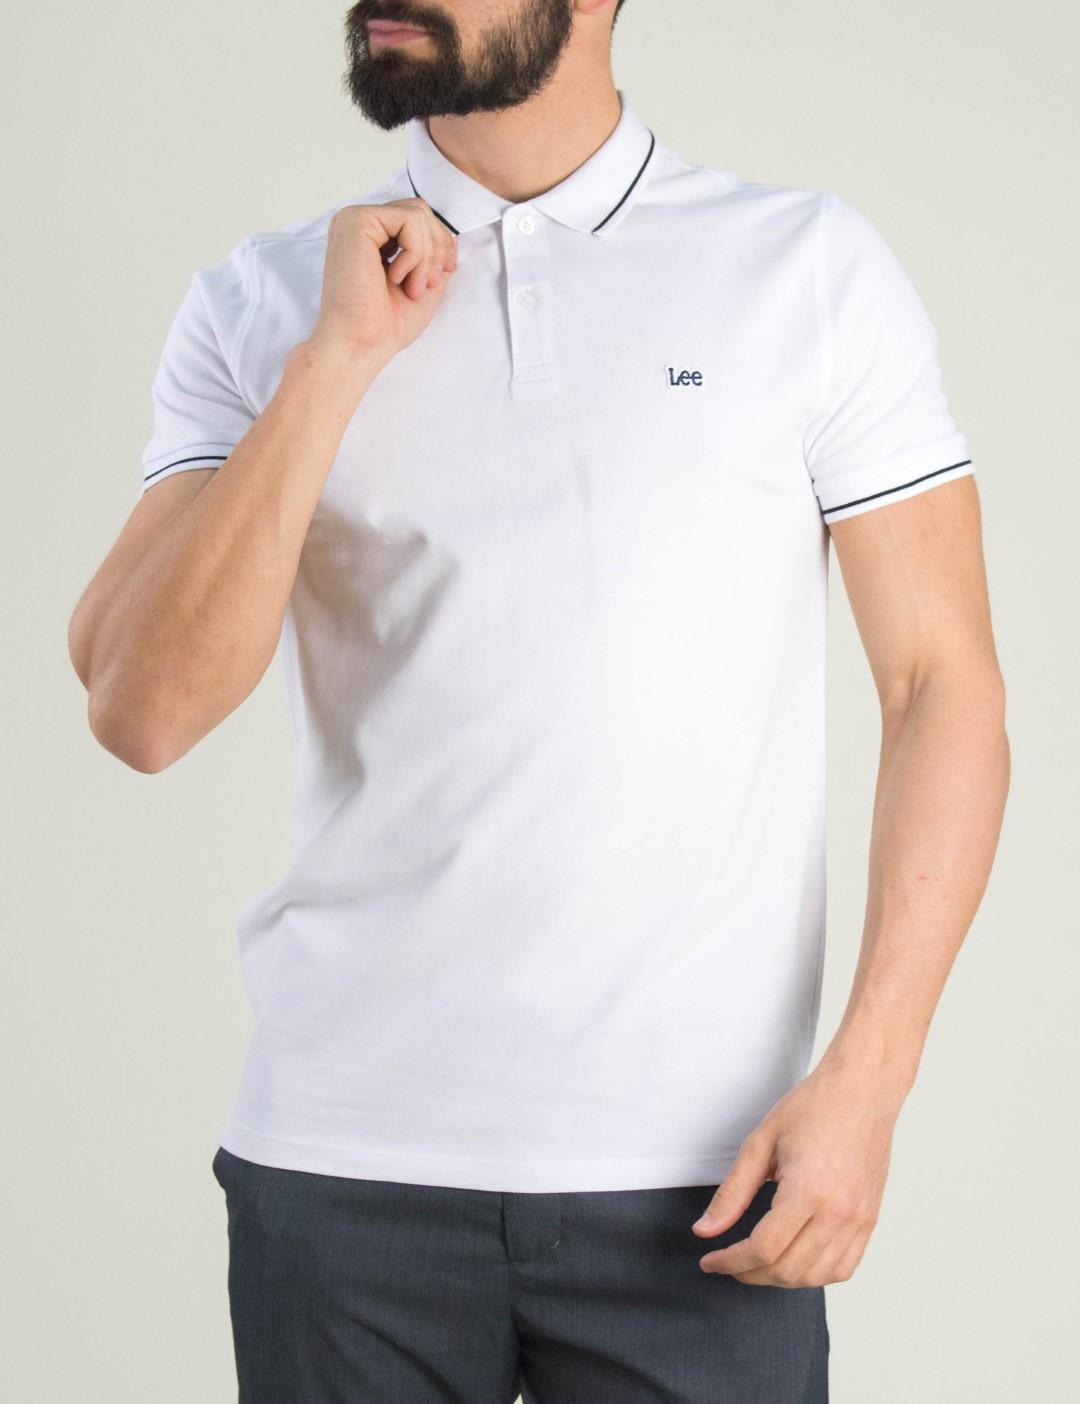 14a315590ad4 Ανδρική λευκή Polo κοντομάνικη μπλούζα Lee L61ARLLJ